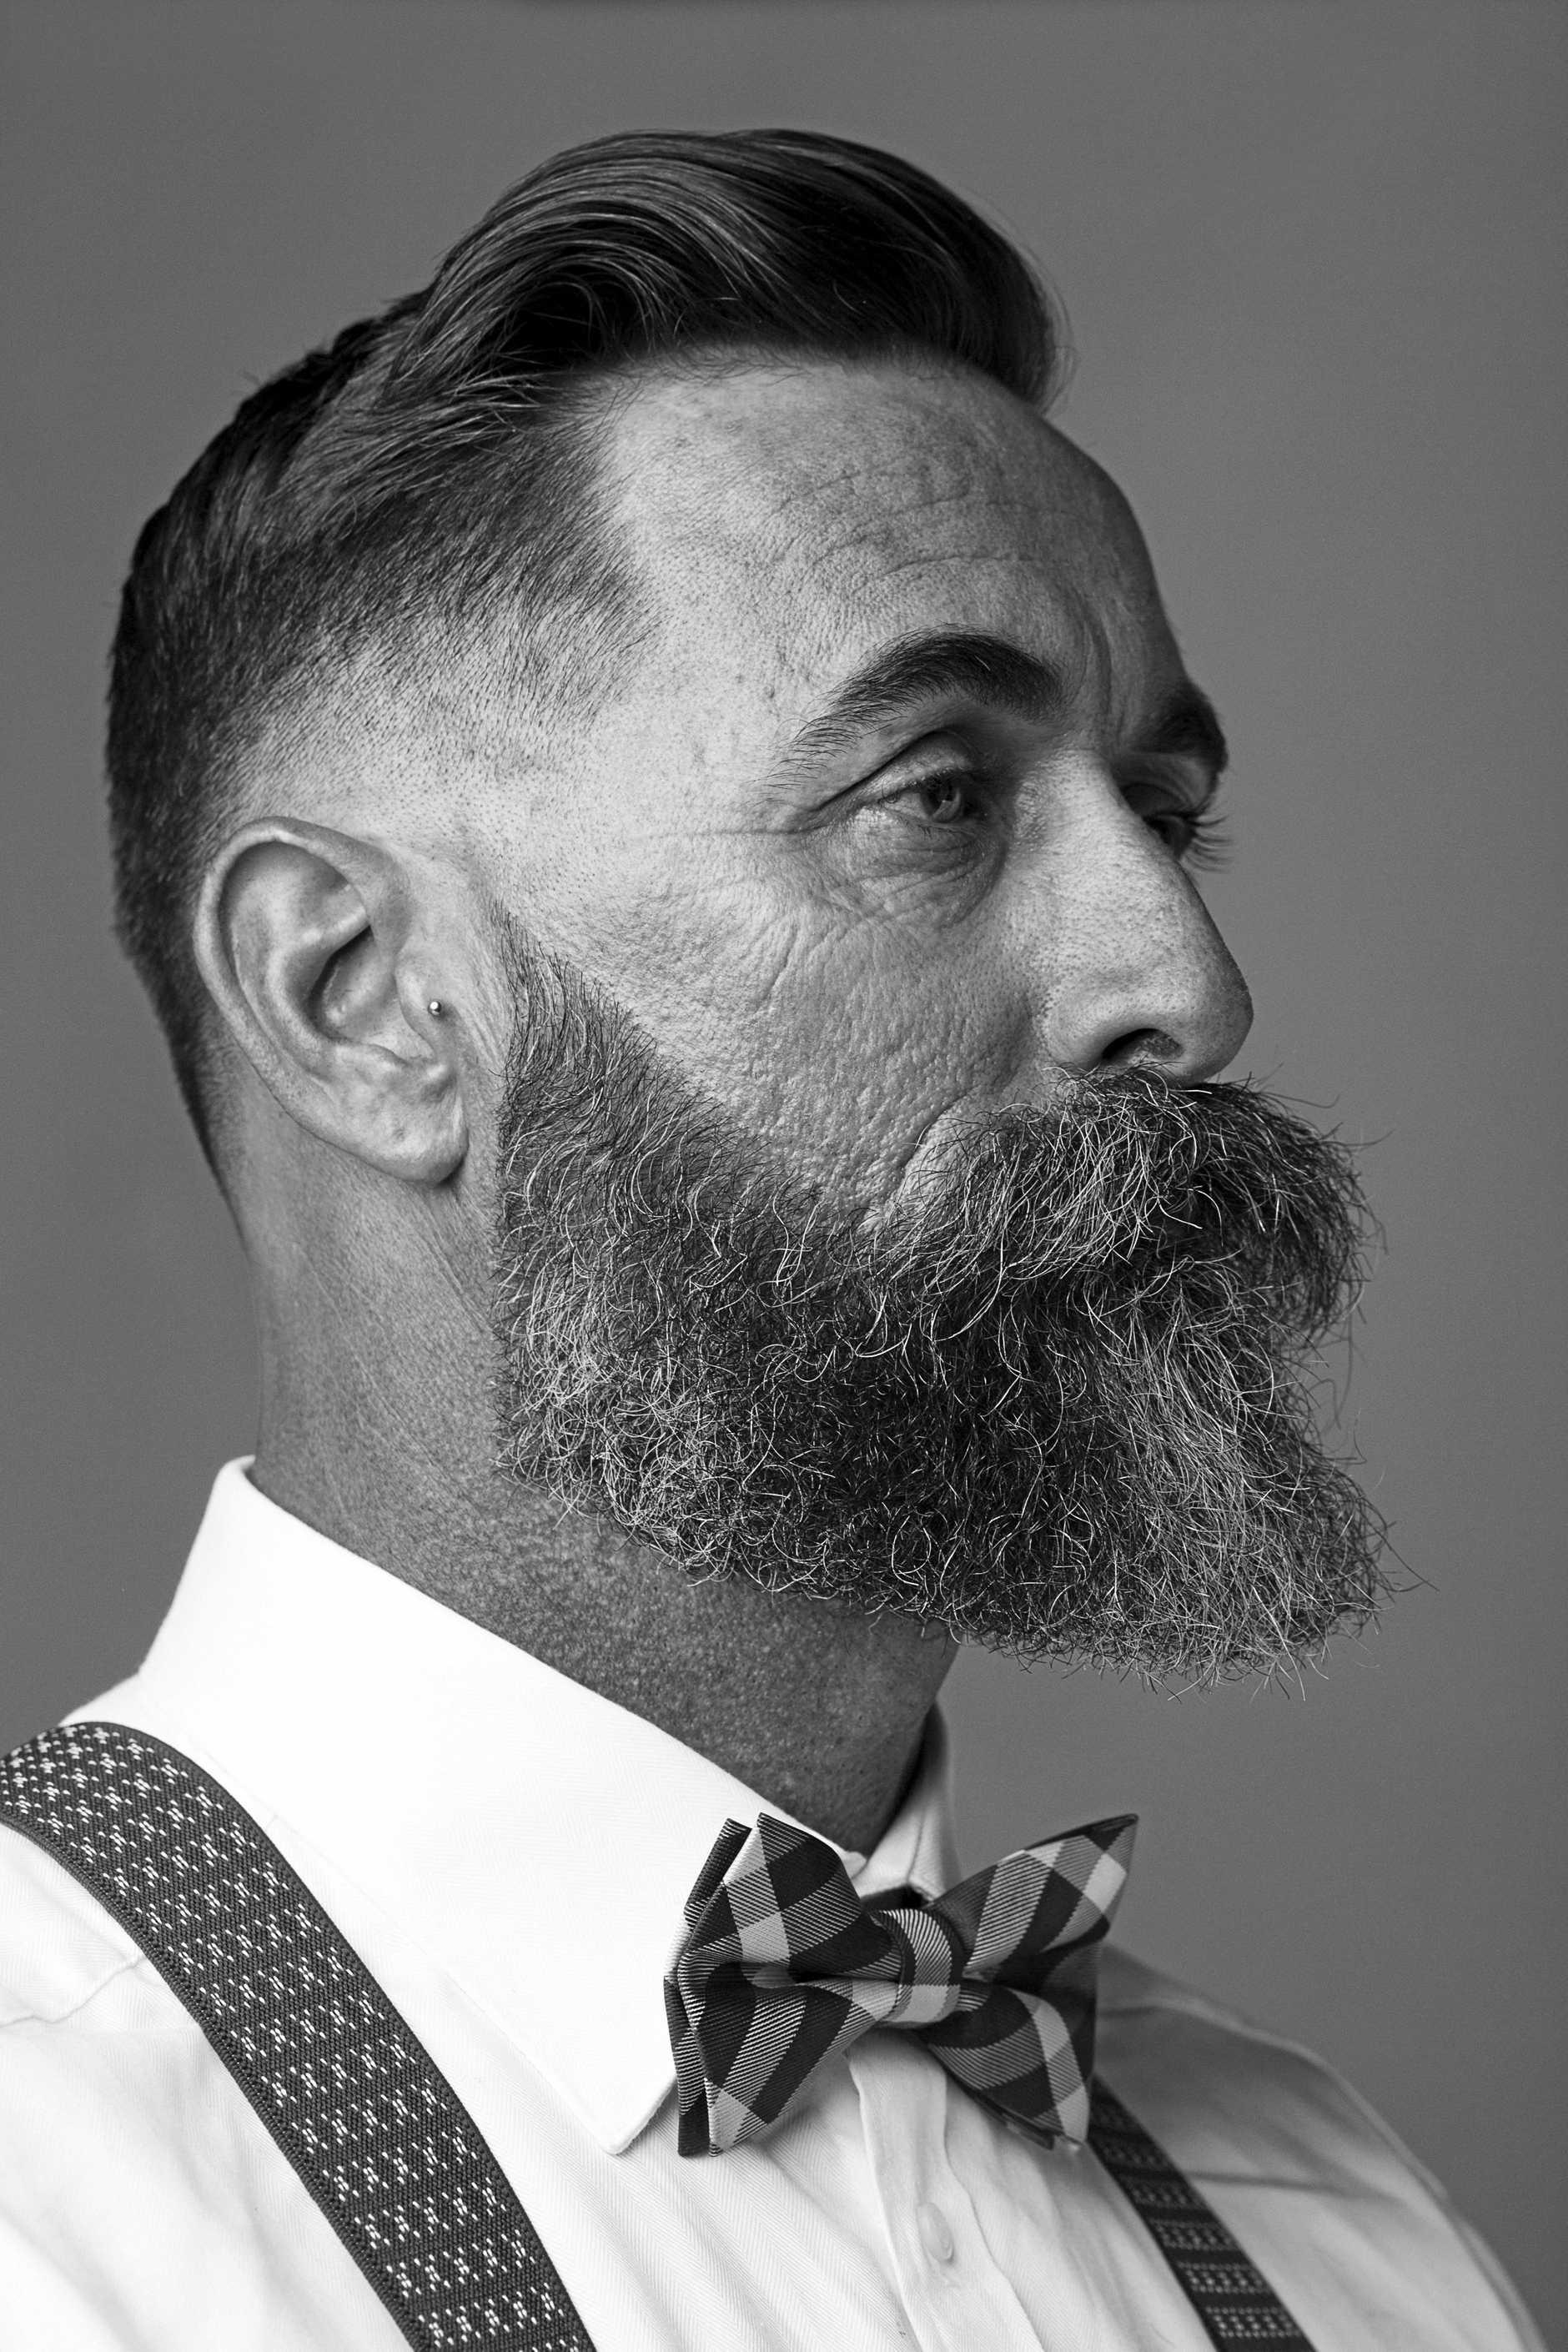 SHARP LOOK: image of beard work from The Garage Barbershop